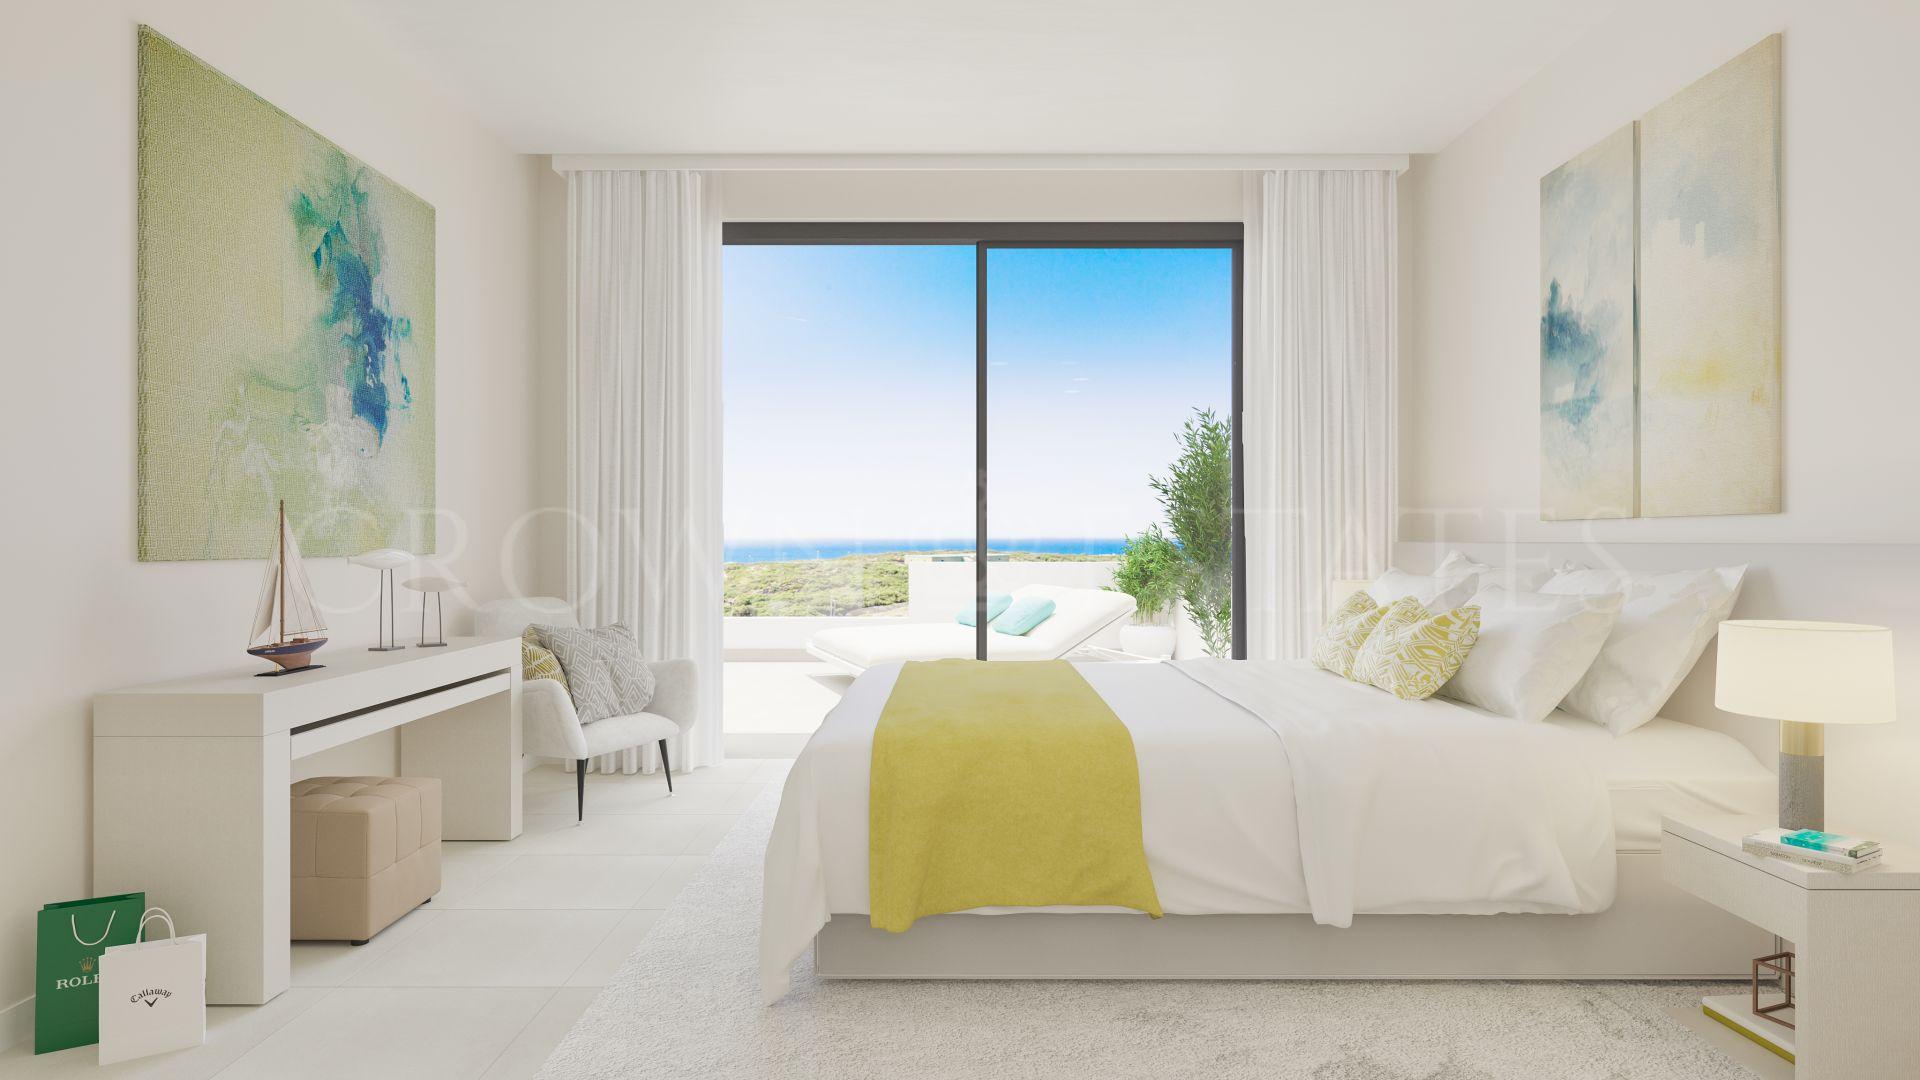 Terrazas de Cortesín Seaviews, apartments and townhouses in Finca Cortesín, a paradise on earth for golf lovers.